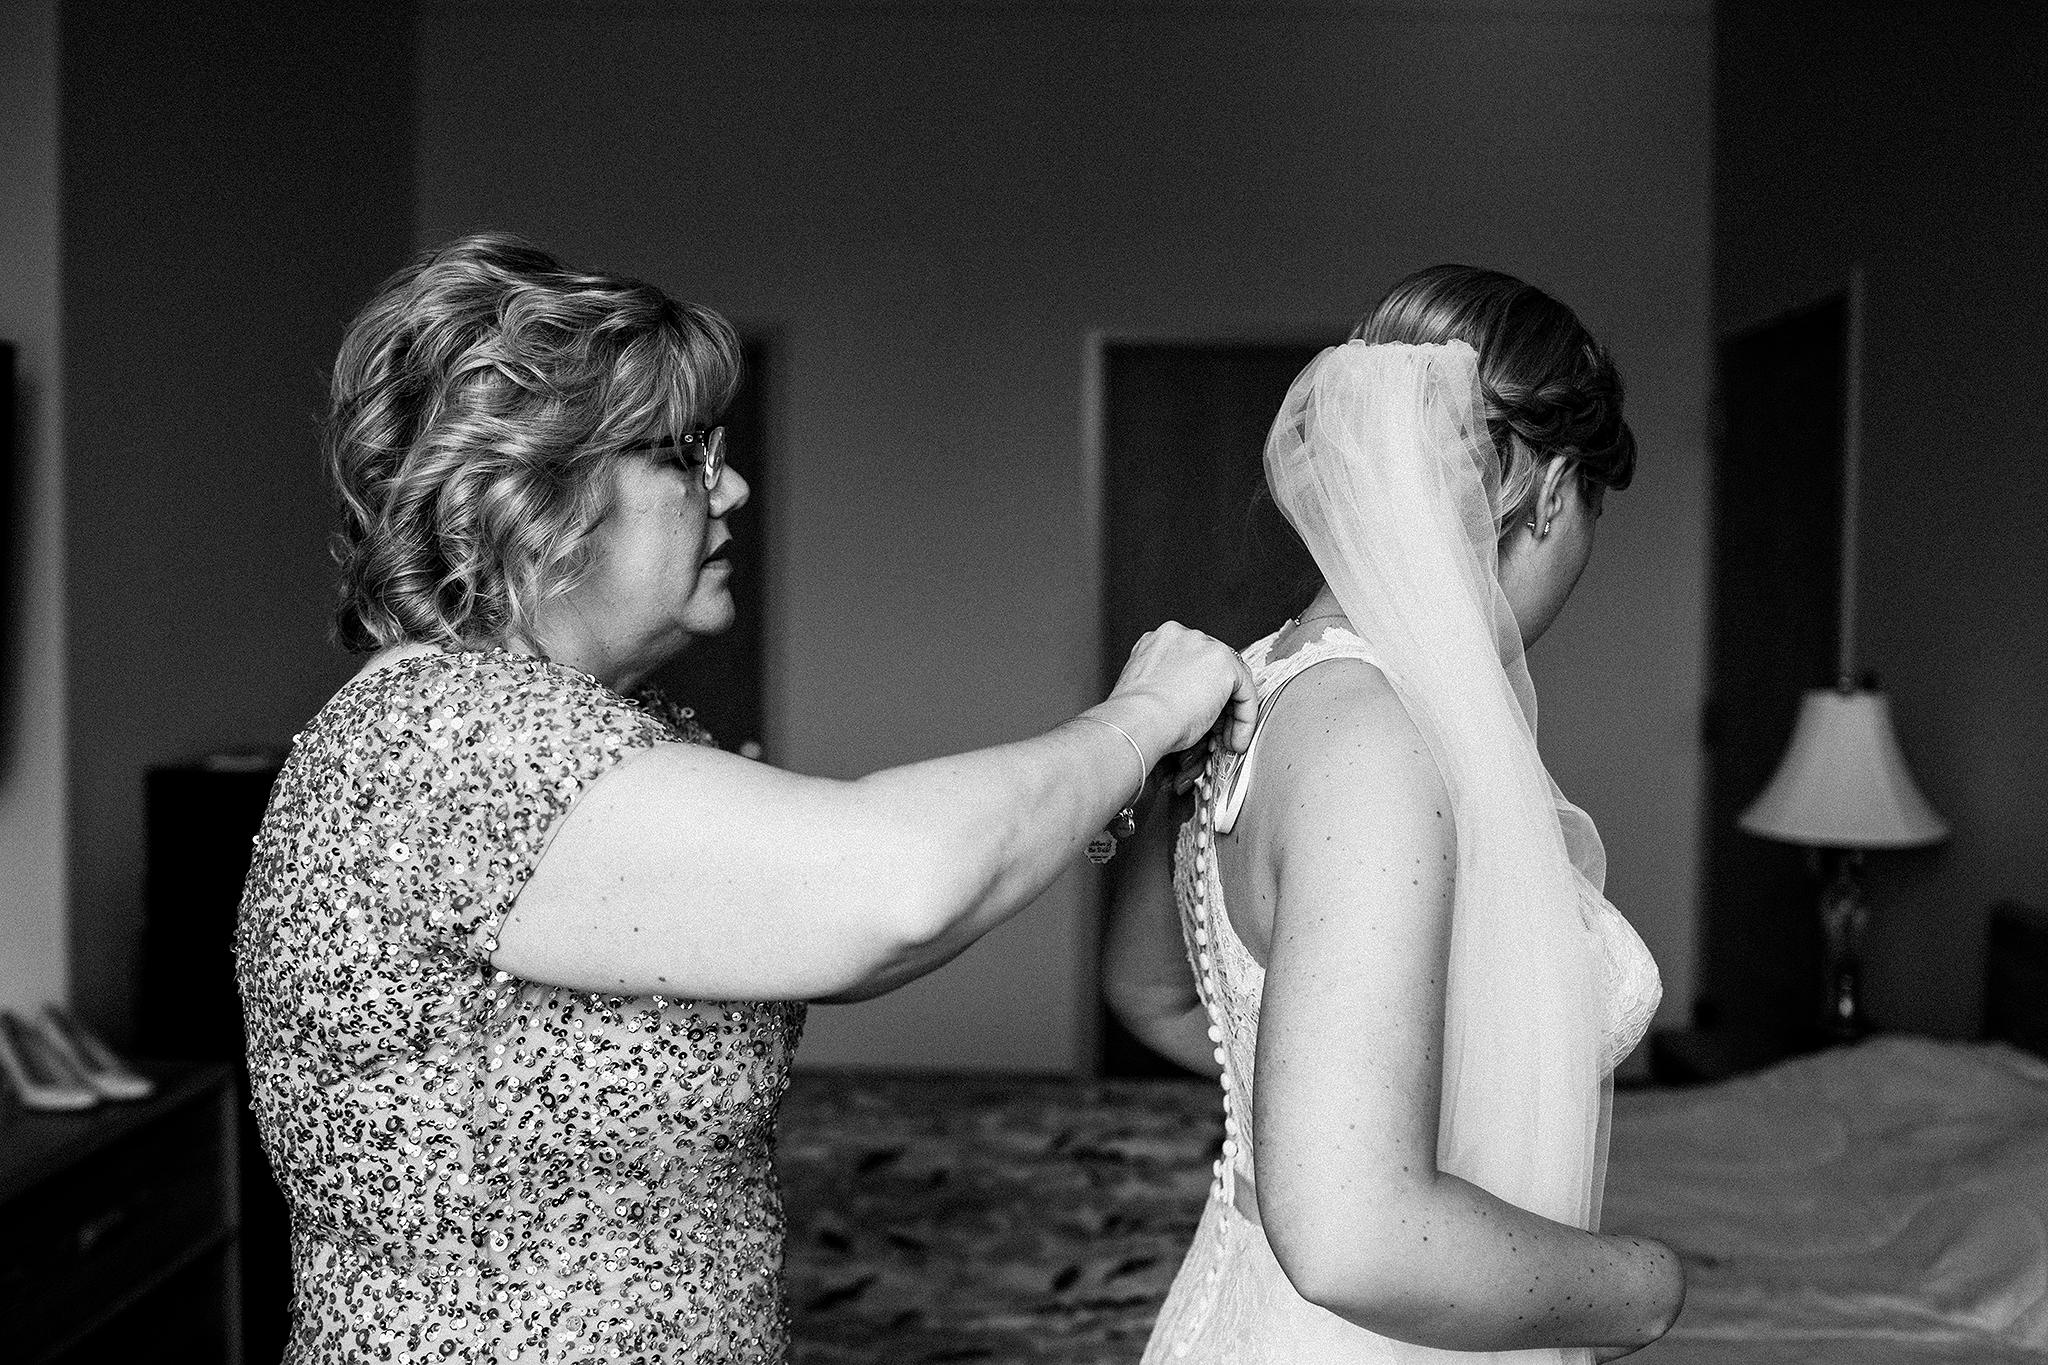 mom zipping up bride's wedding dress | dekalb, IL wedding photographer